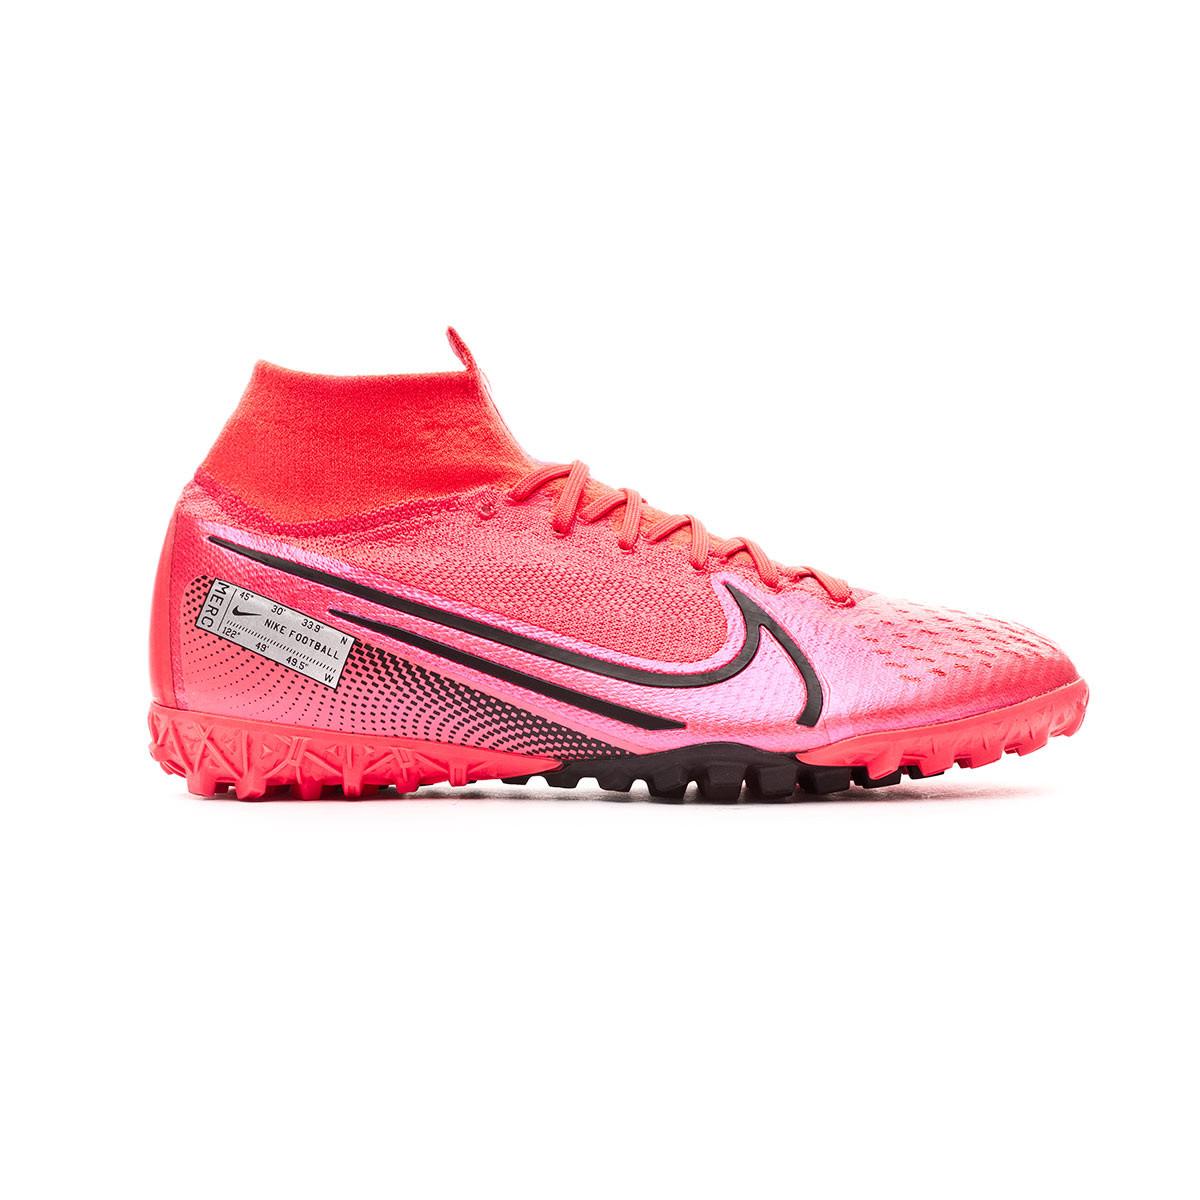 Chaussure de football Nike Mercurial Superfly VII Elite Turf